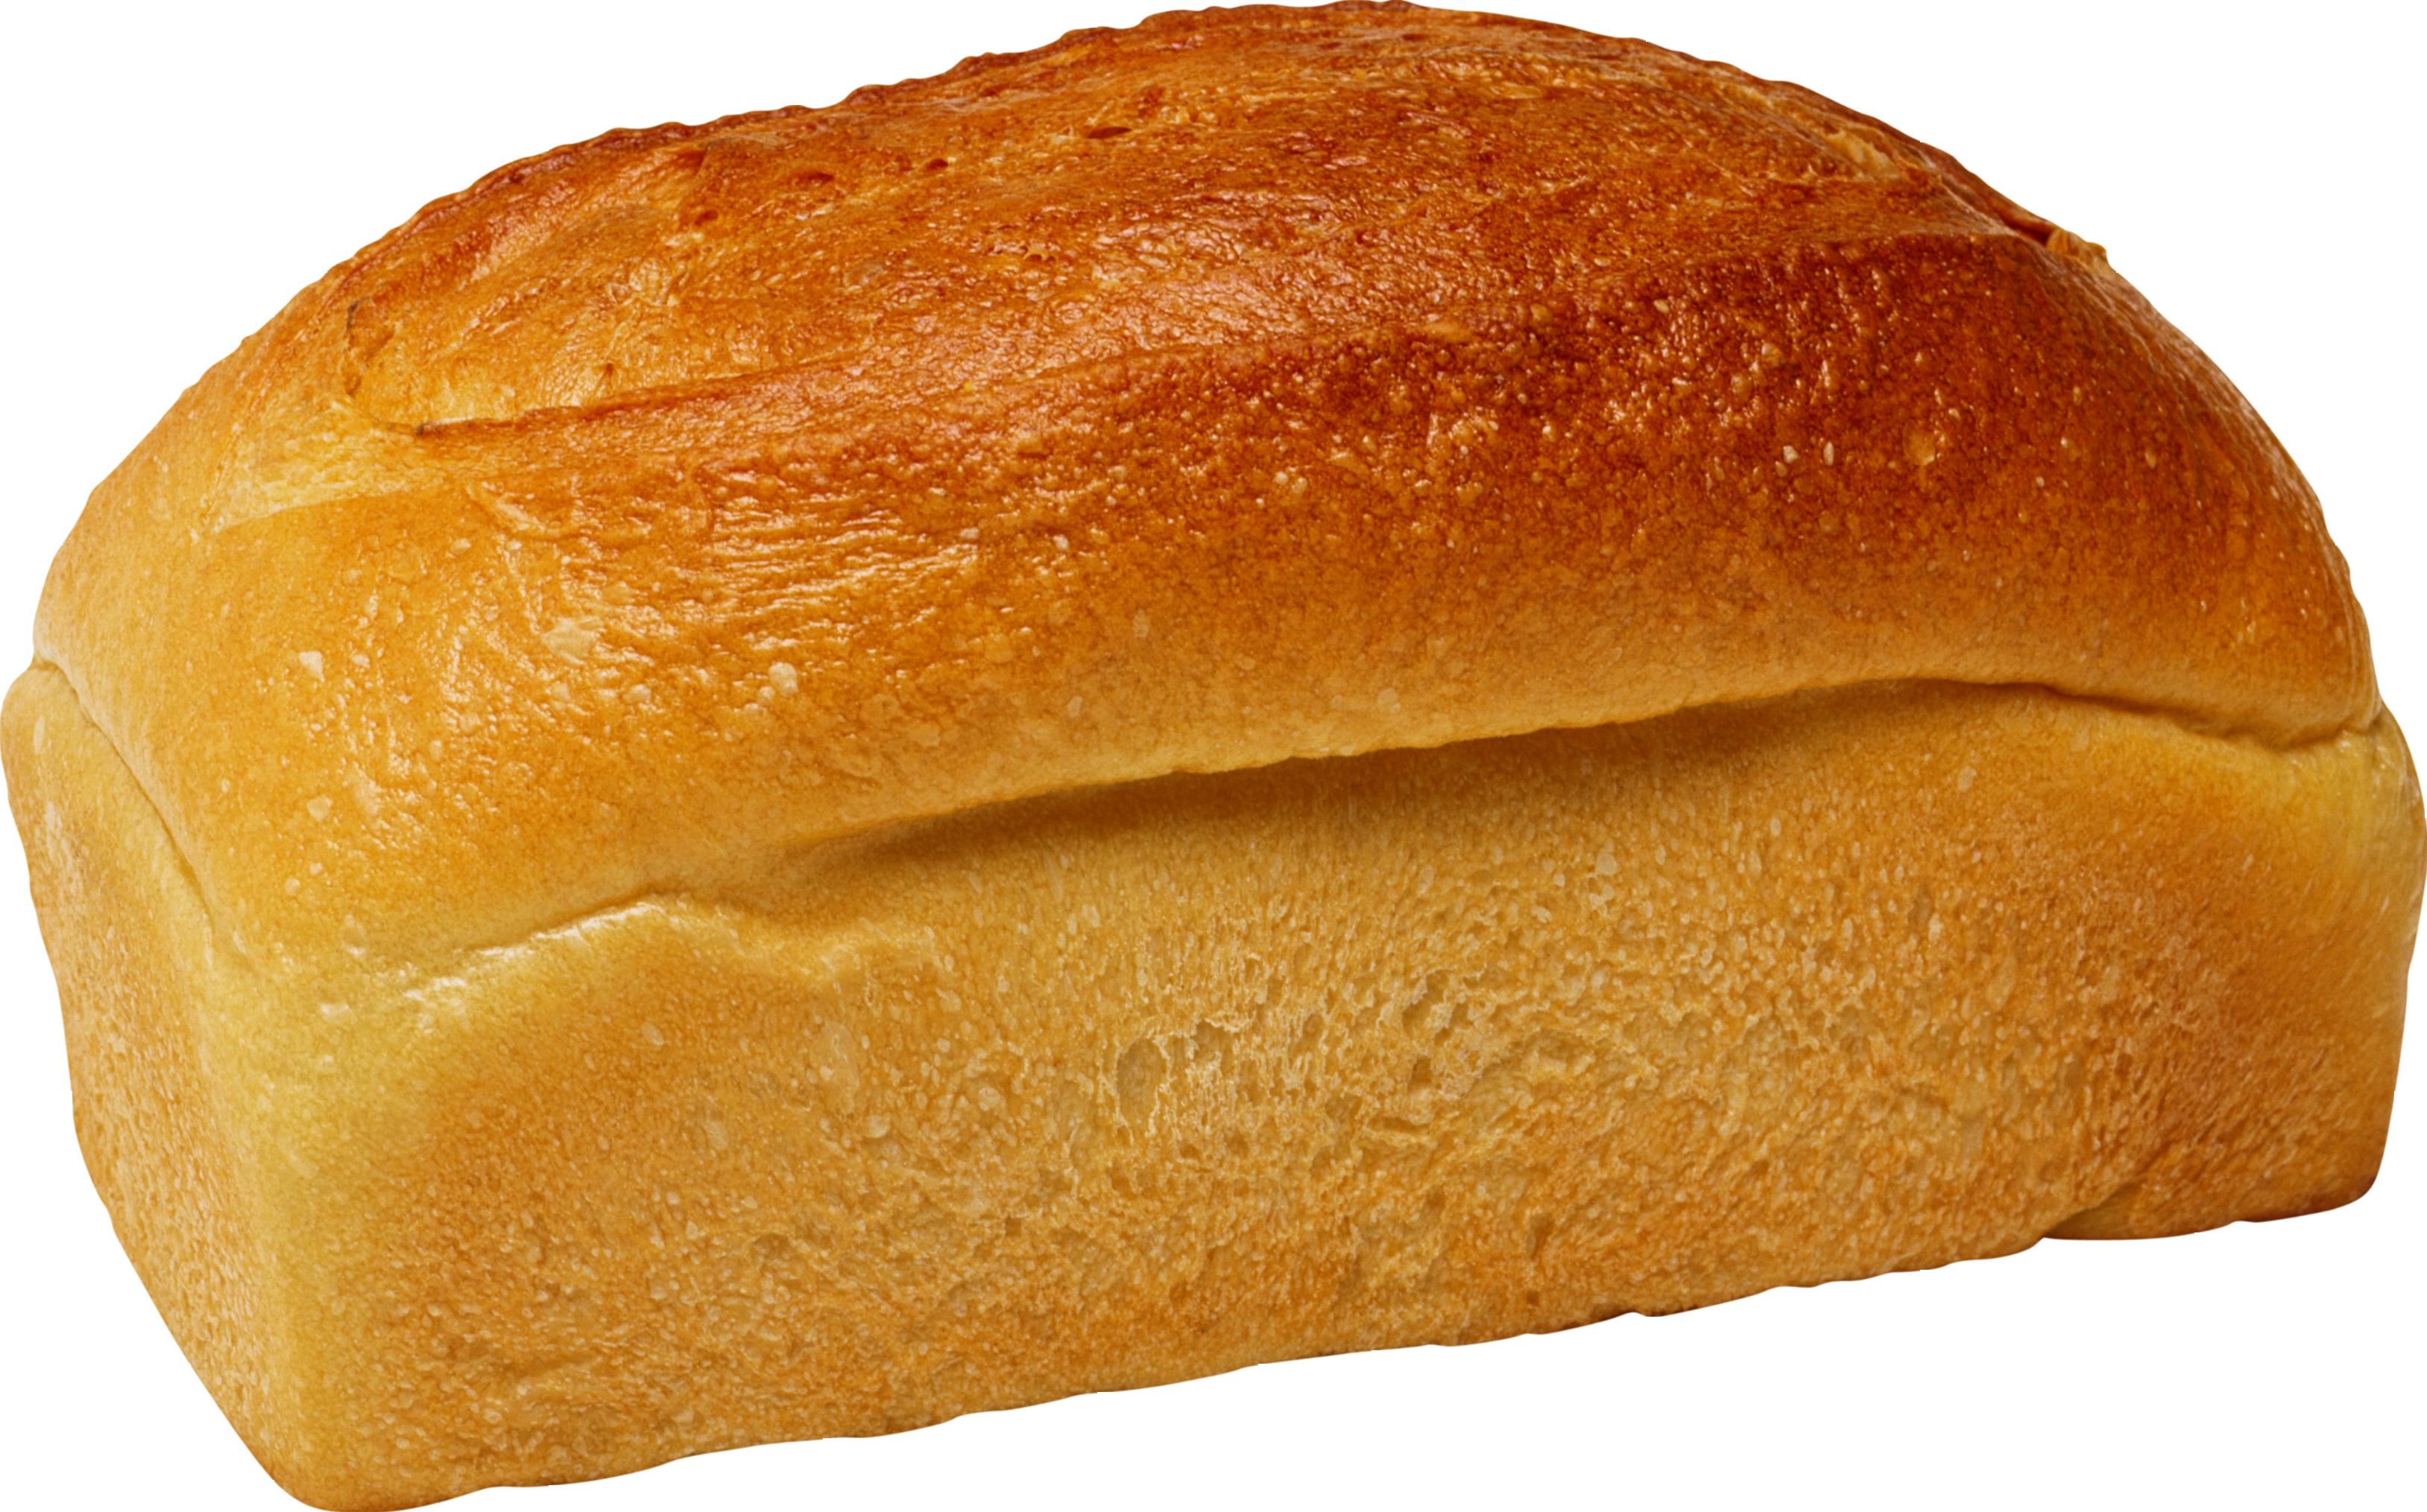 Bread HD PNG - 93328